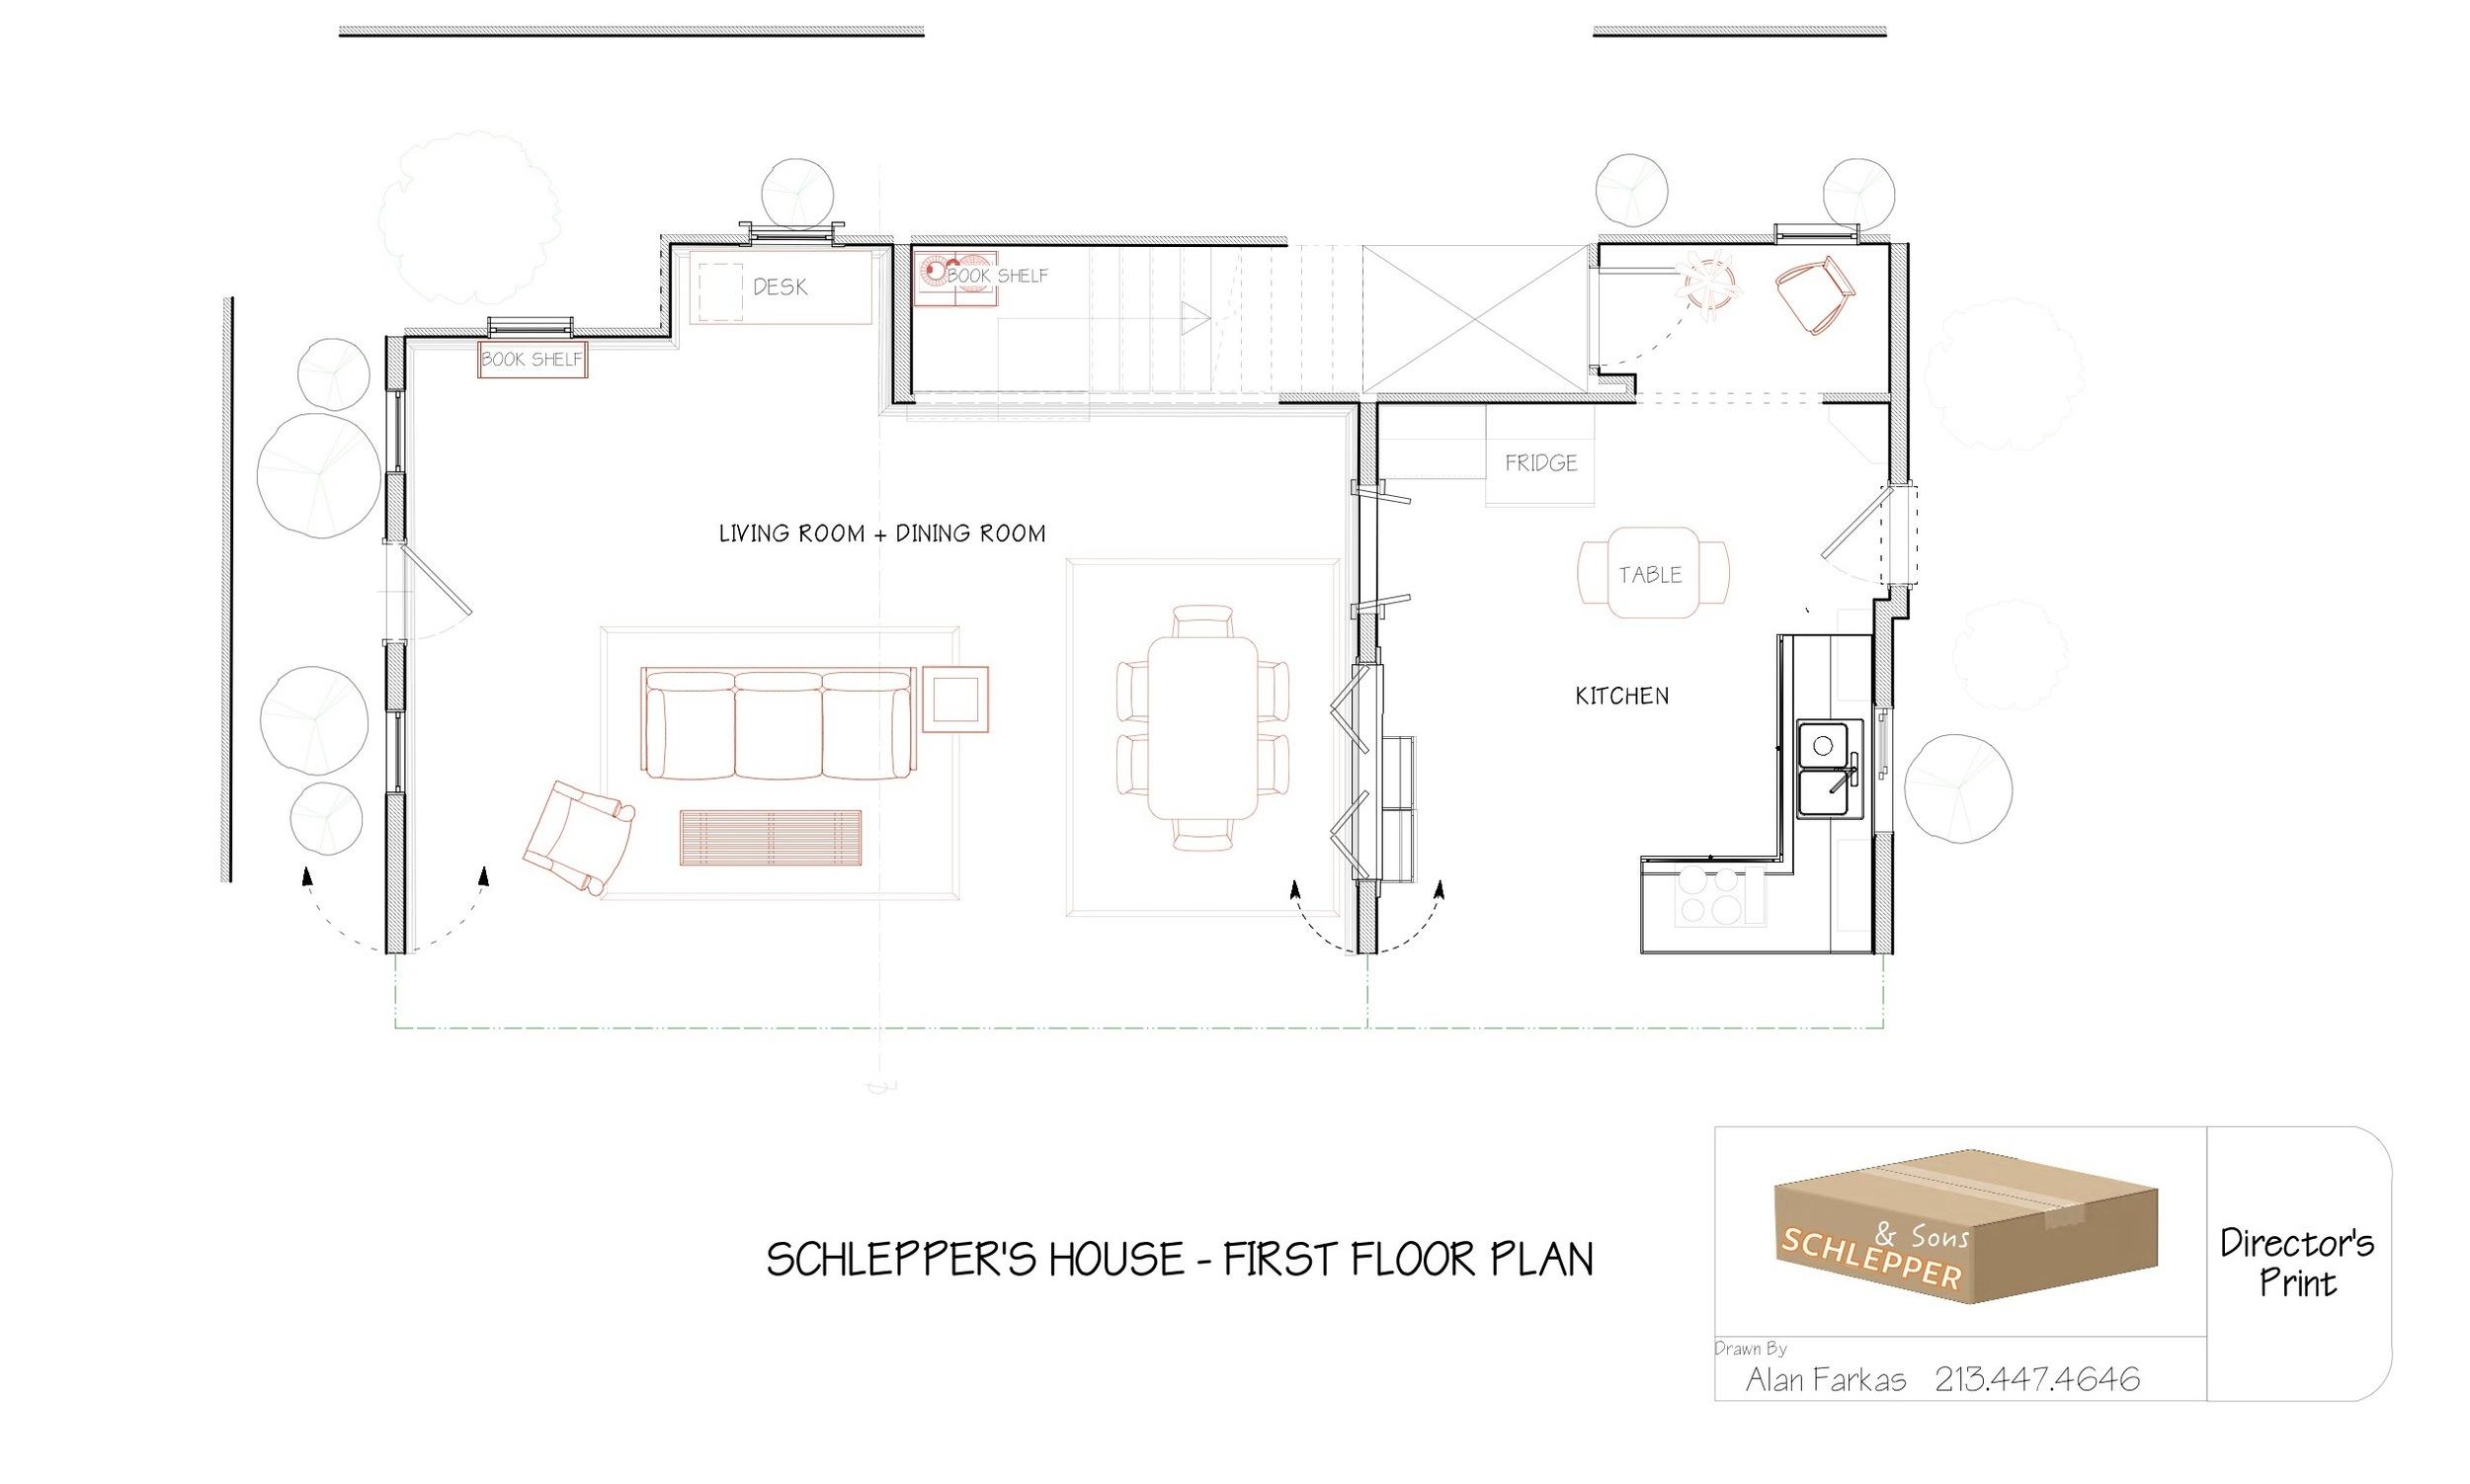 Alan Farkas_3D Set Design + Illustration_Reduced 34.jpeg